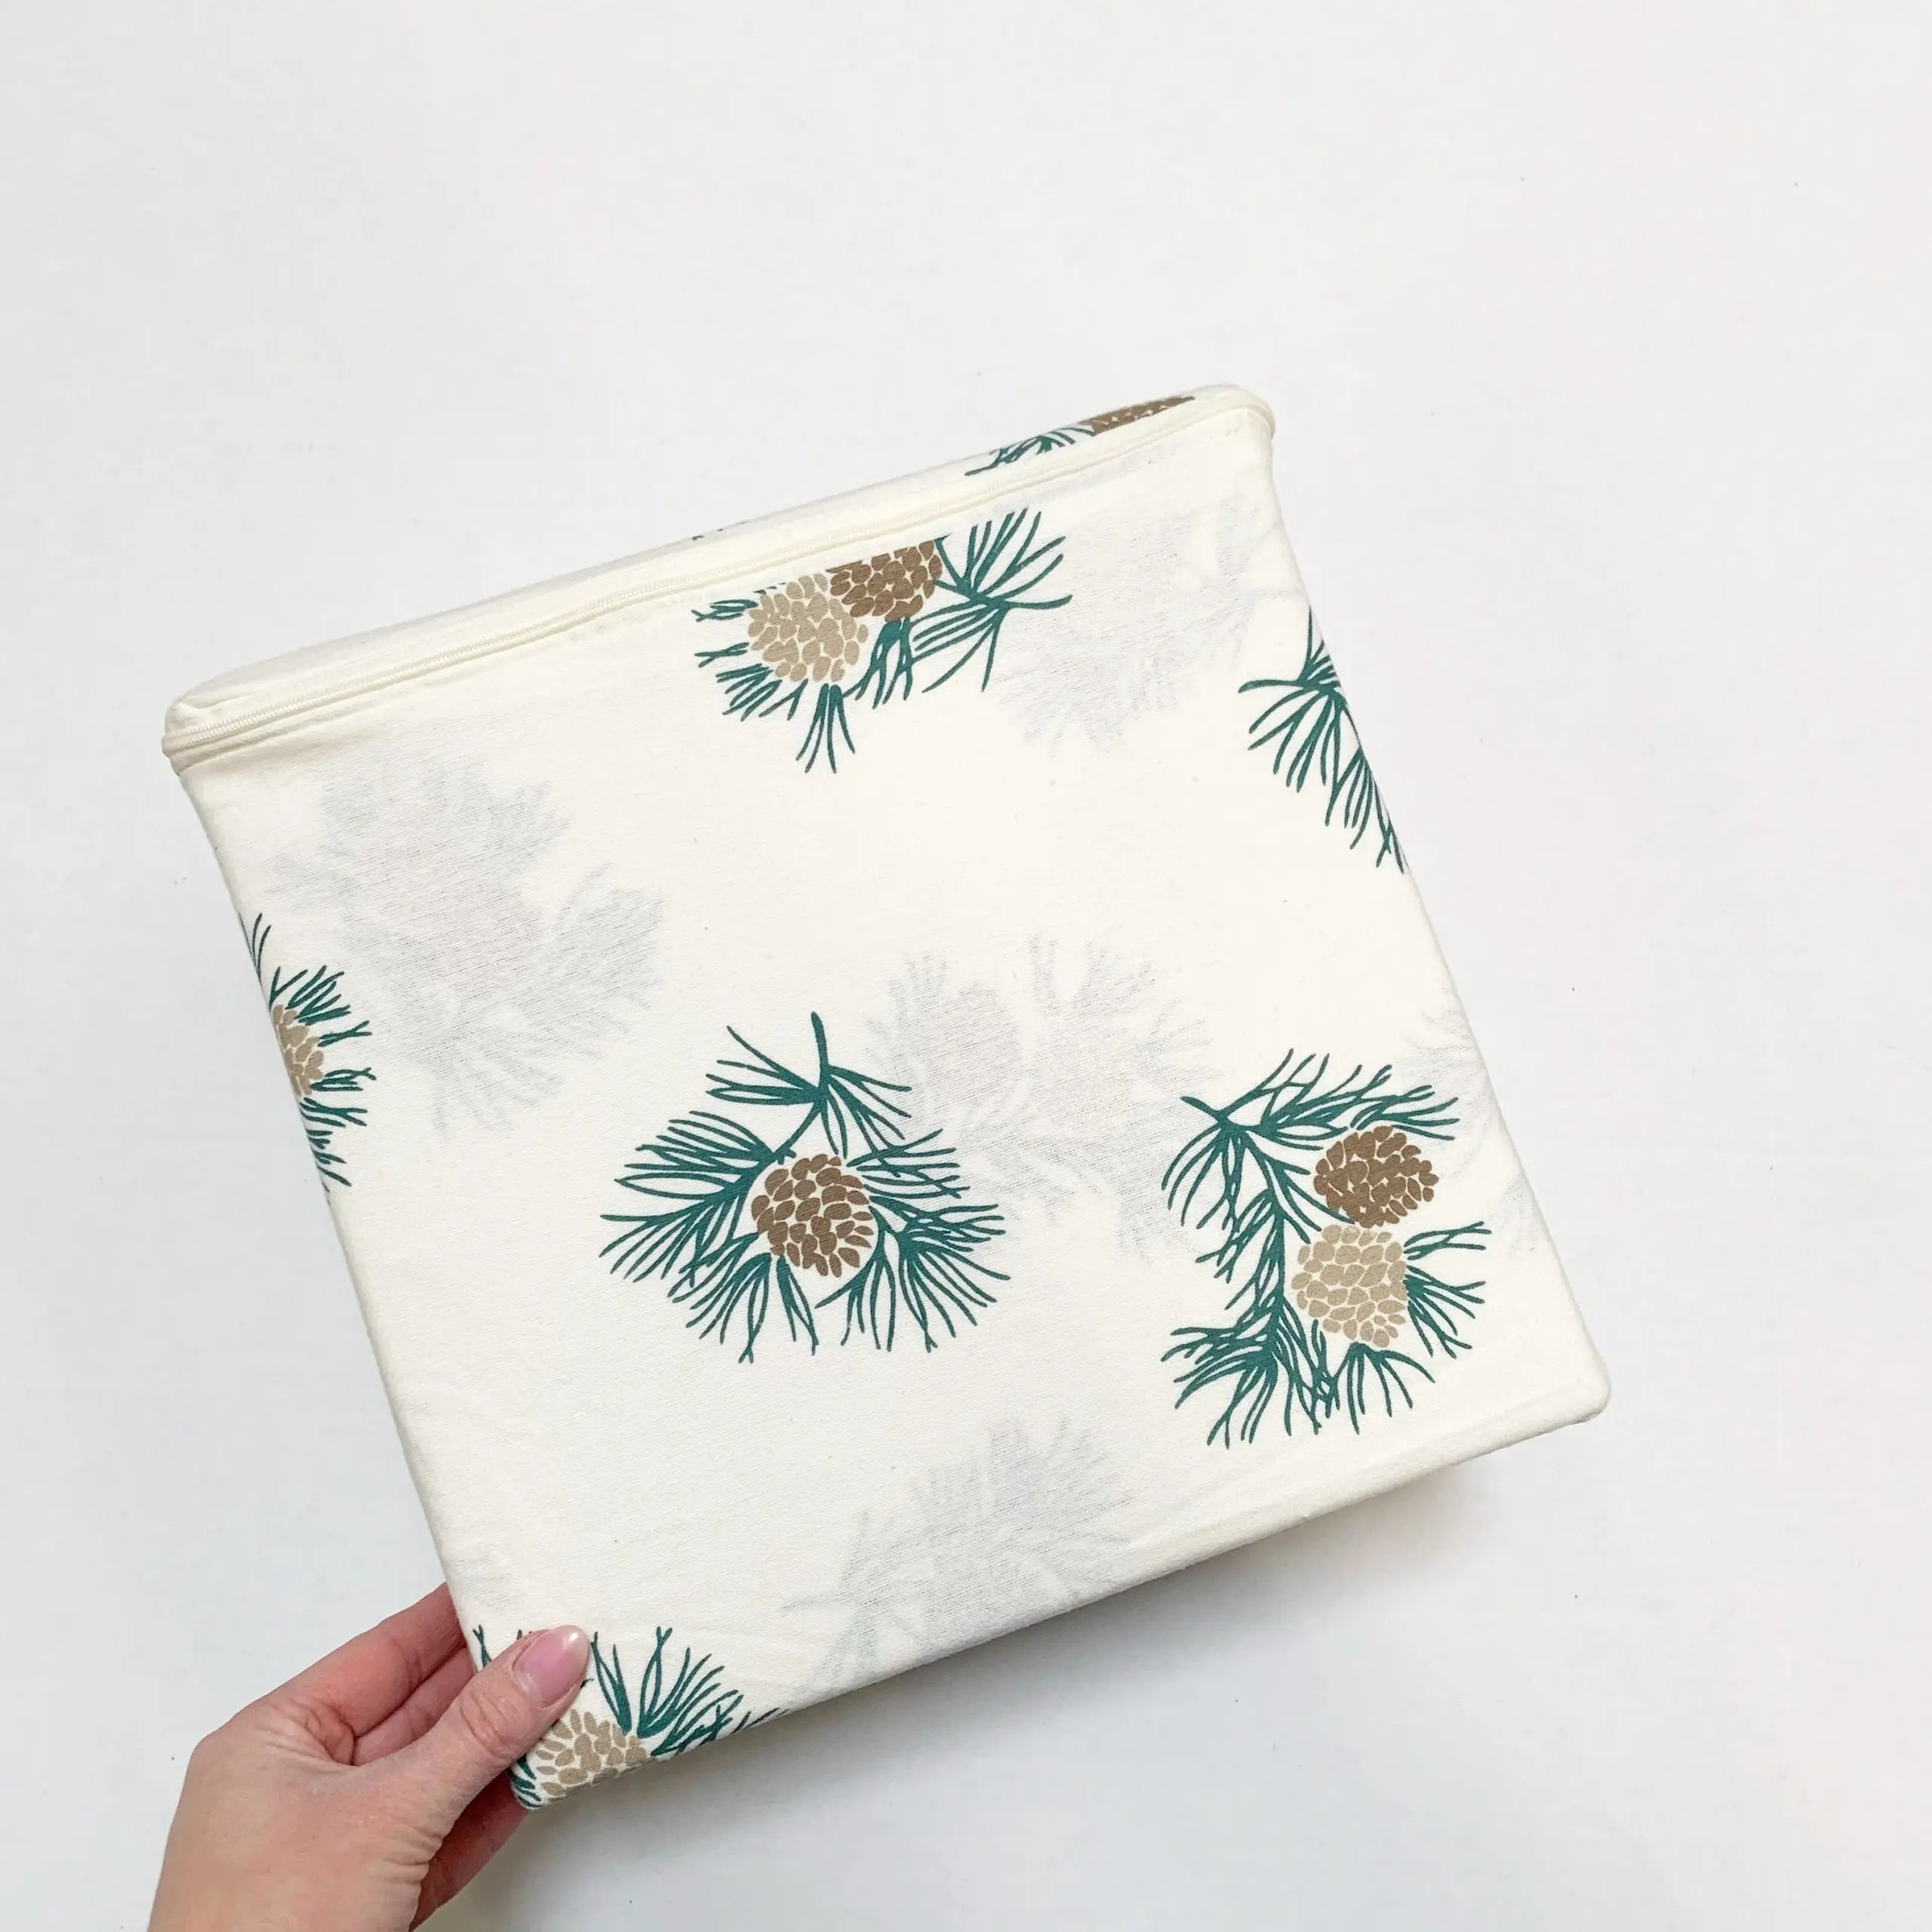 Mainstays Flannel Sheet Set - Pinecones